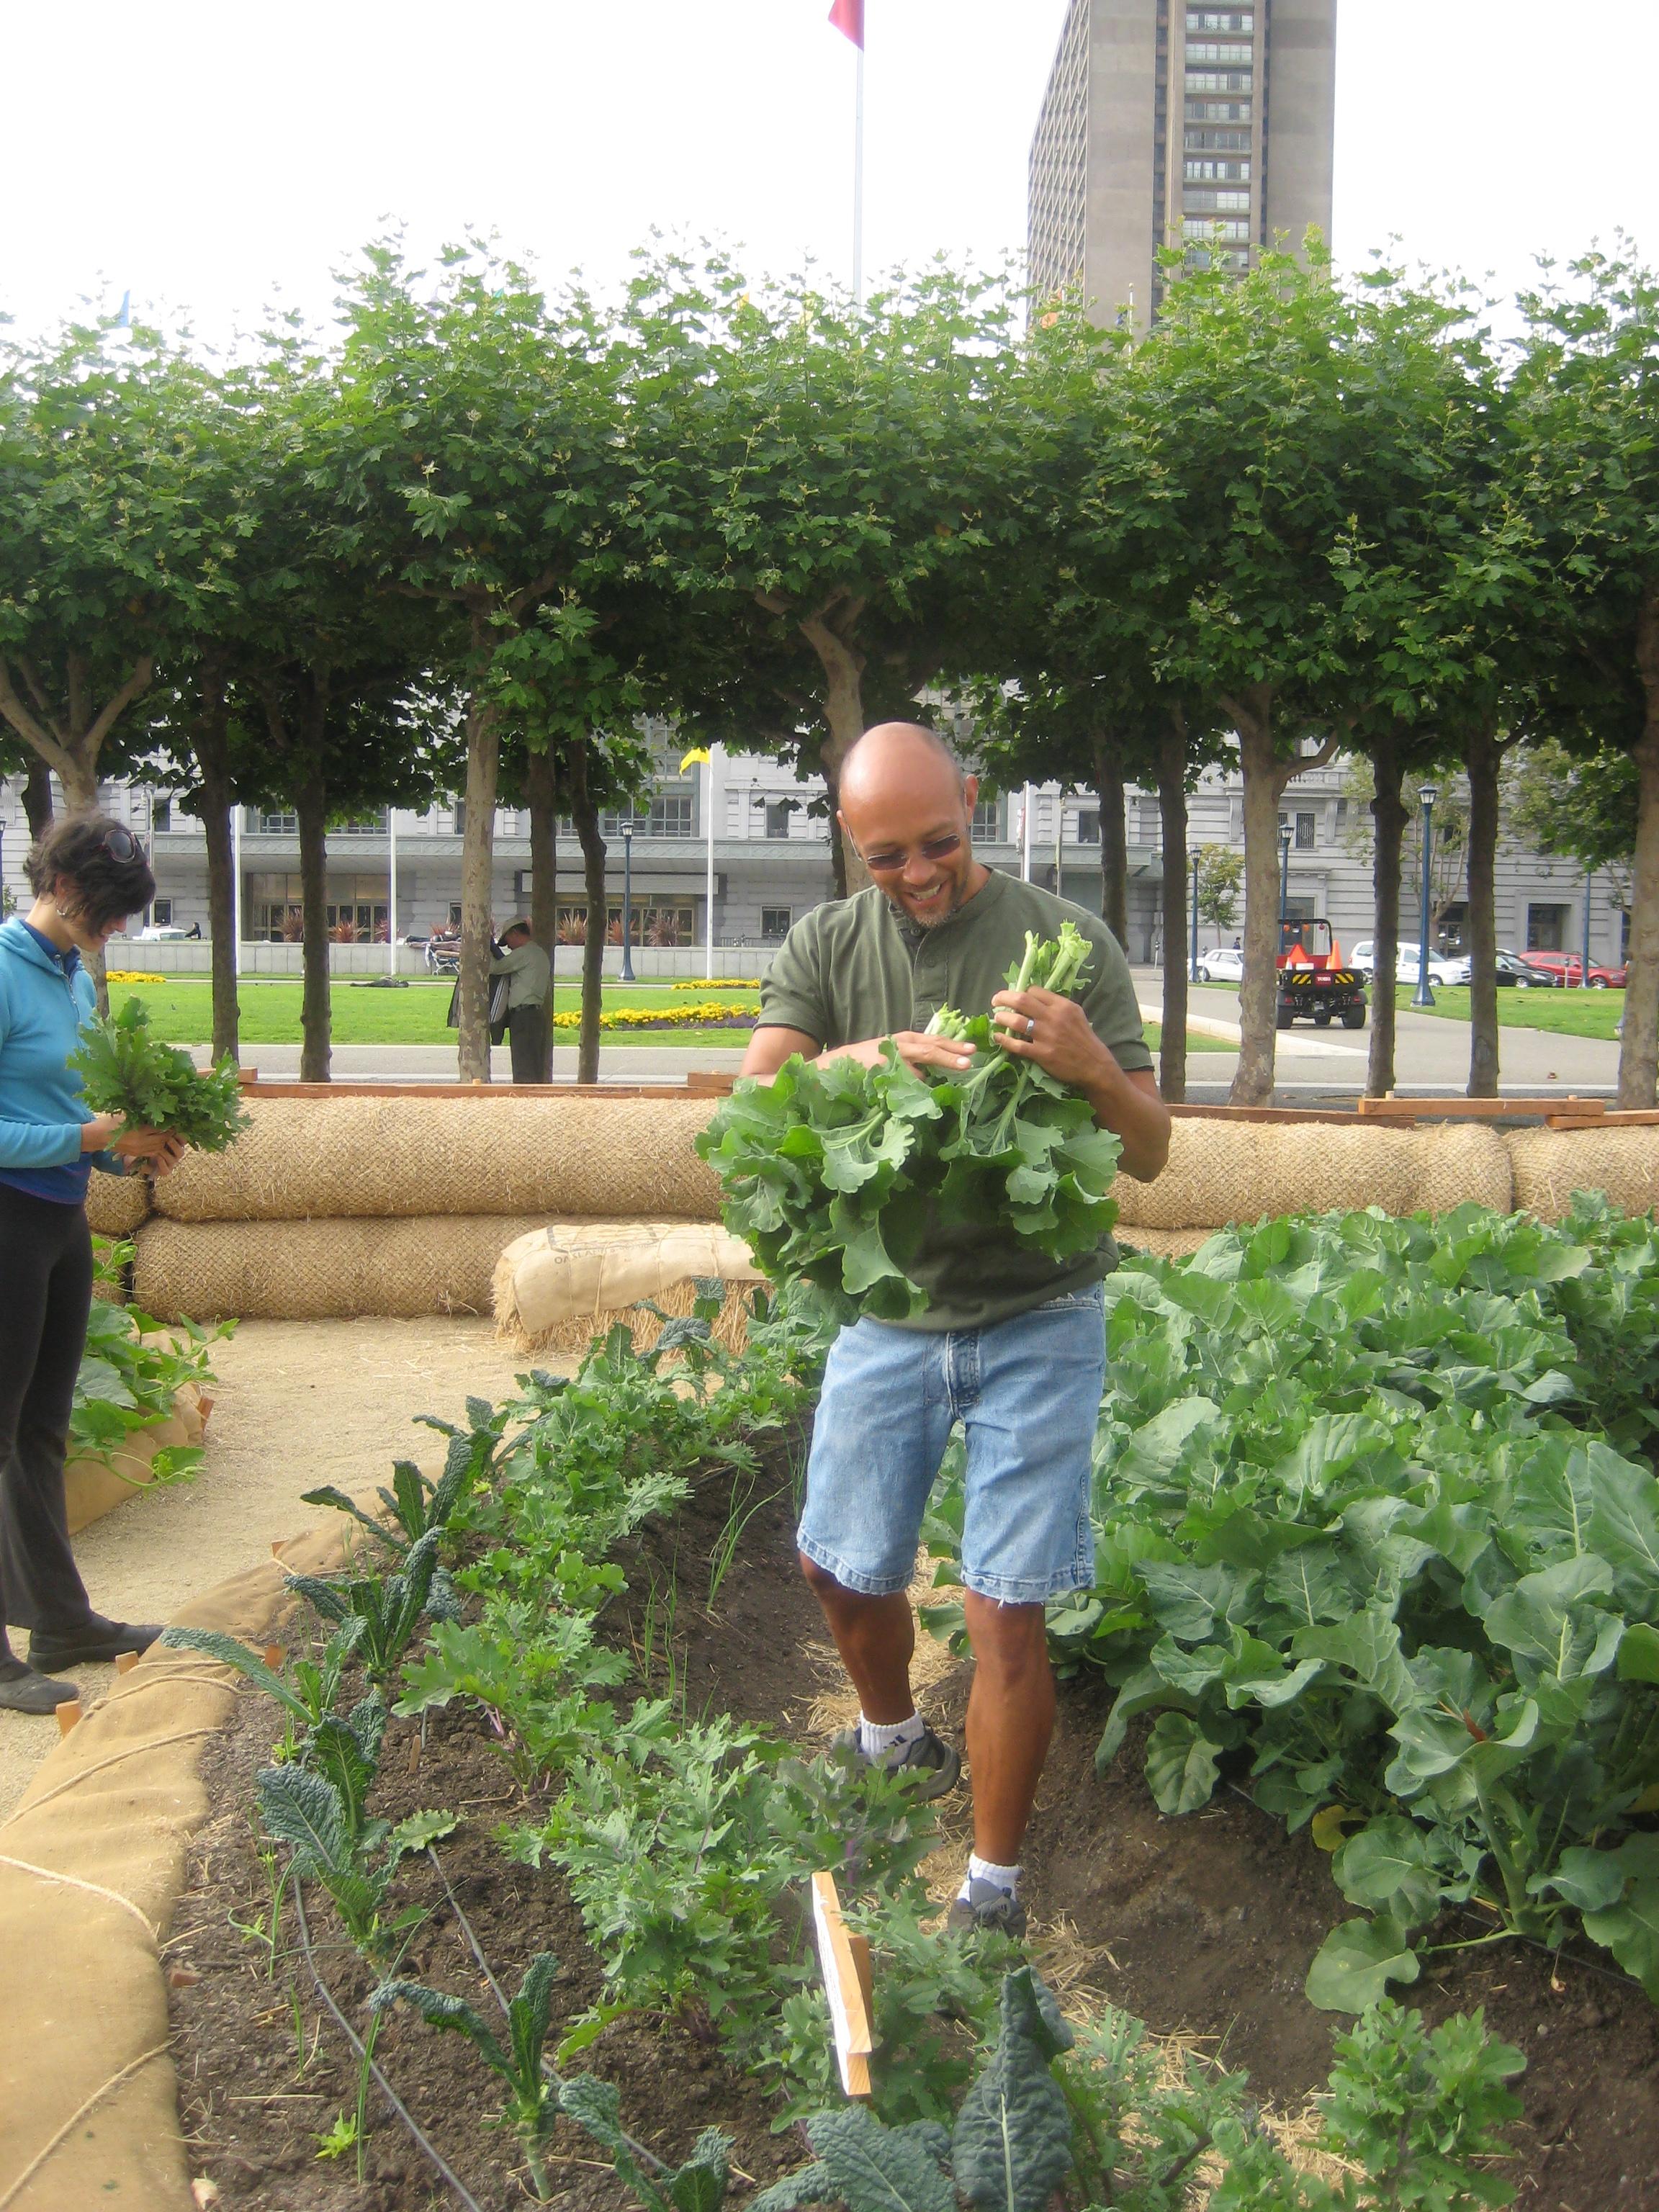 A volunteer works on the harvest.